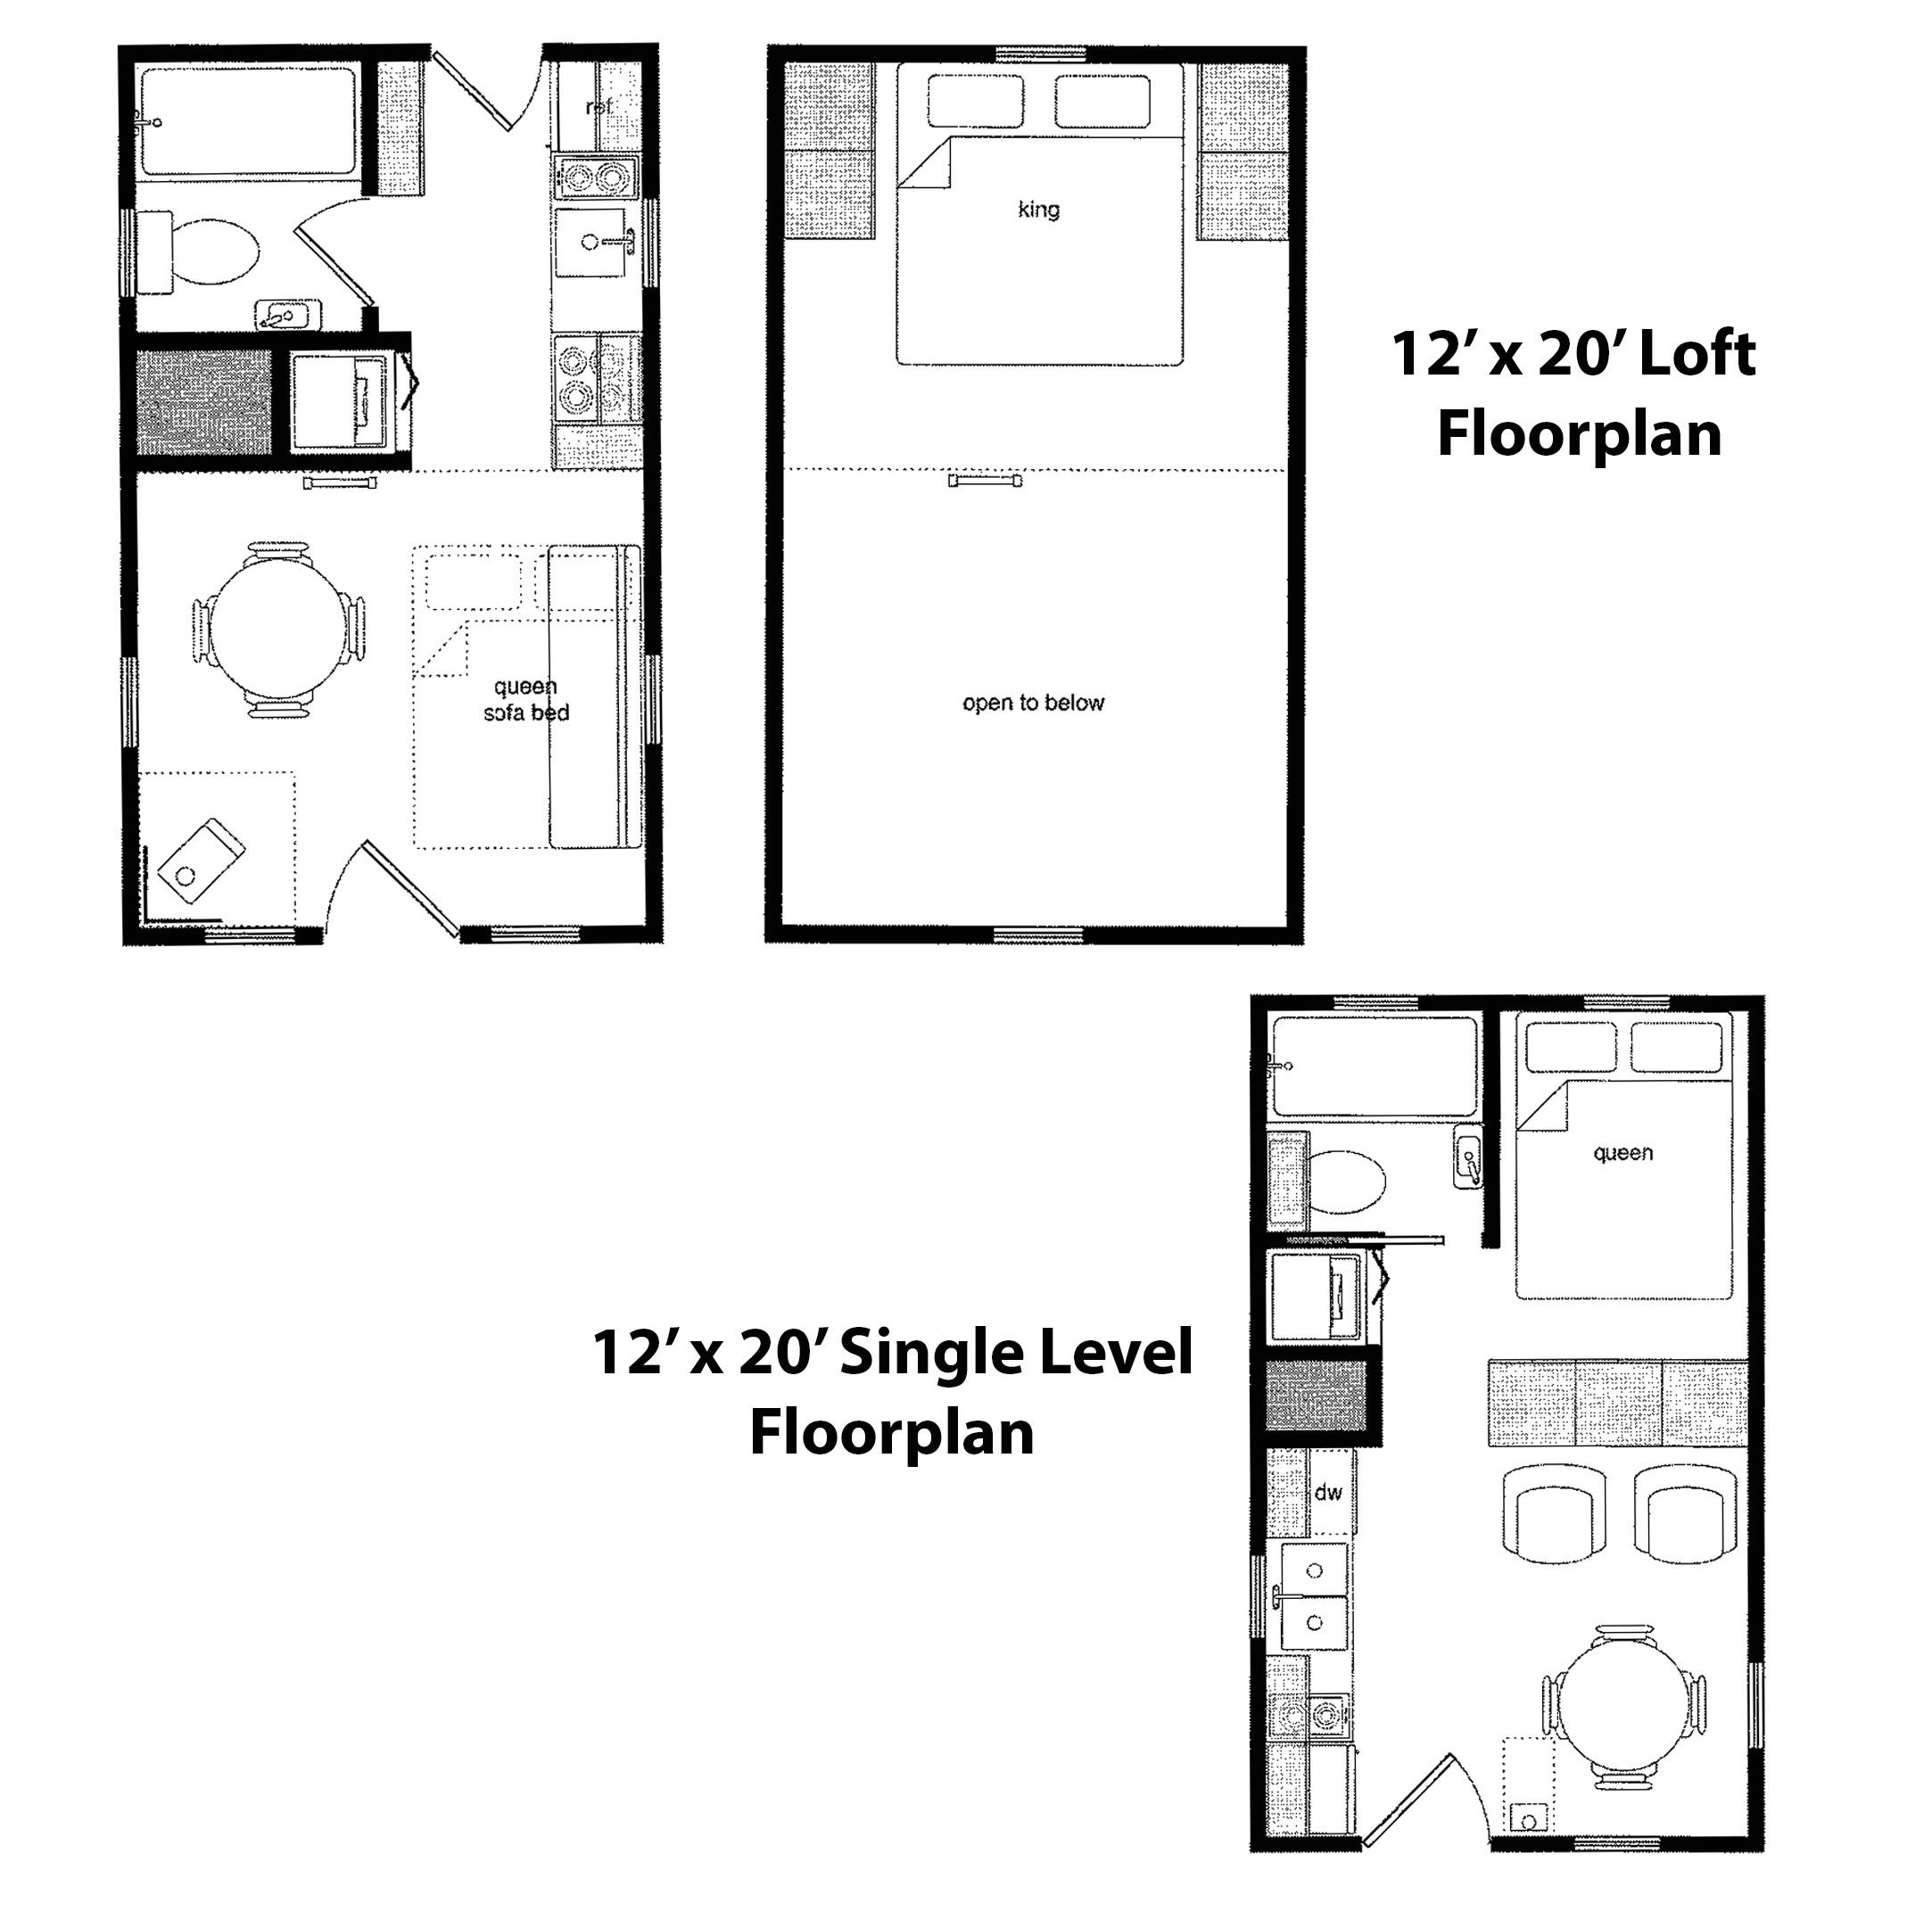 cabins 12 x 24 plans